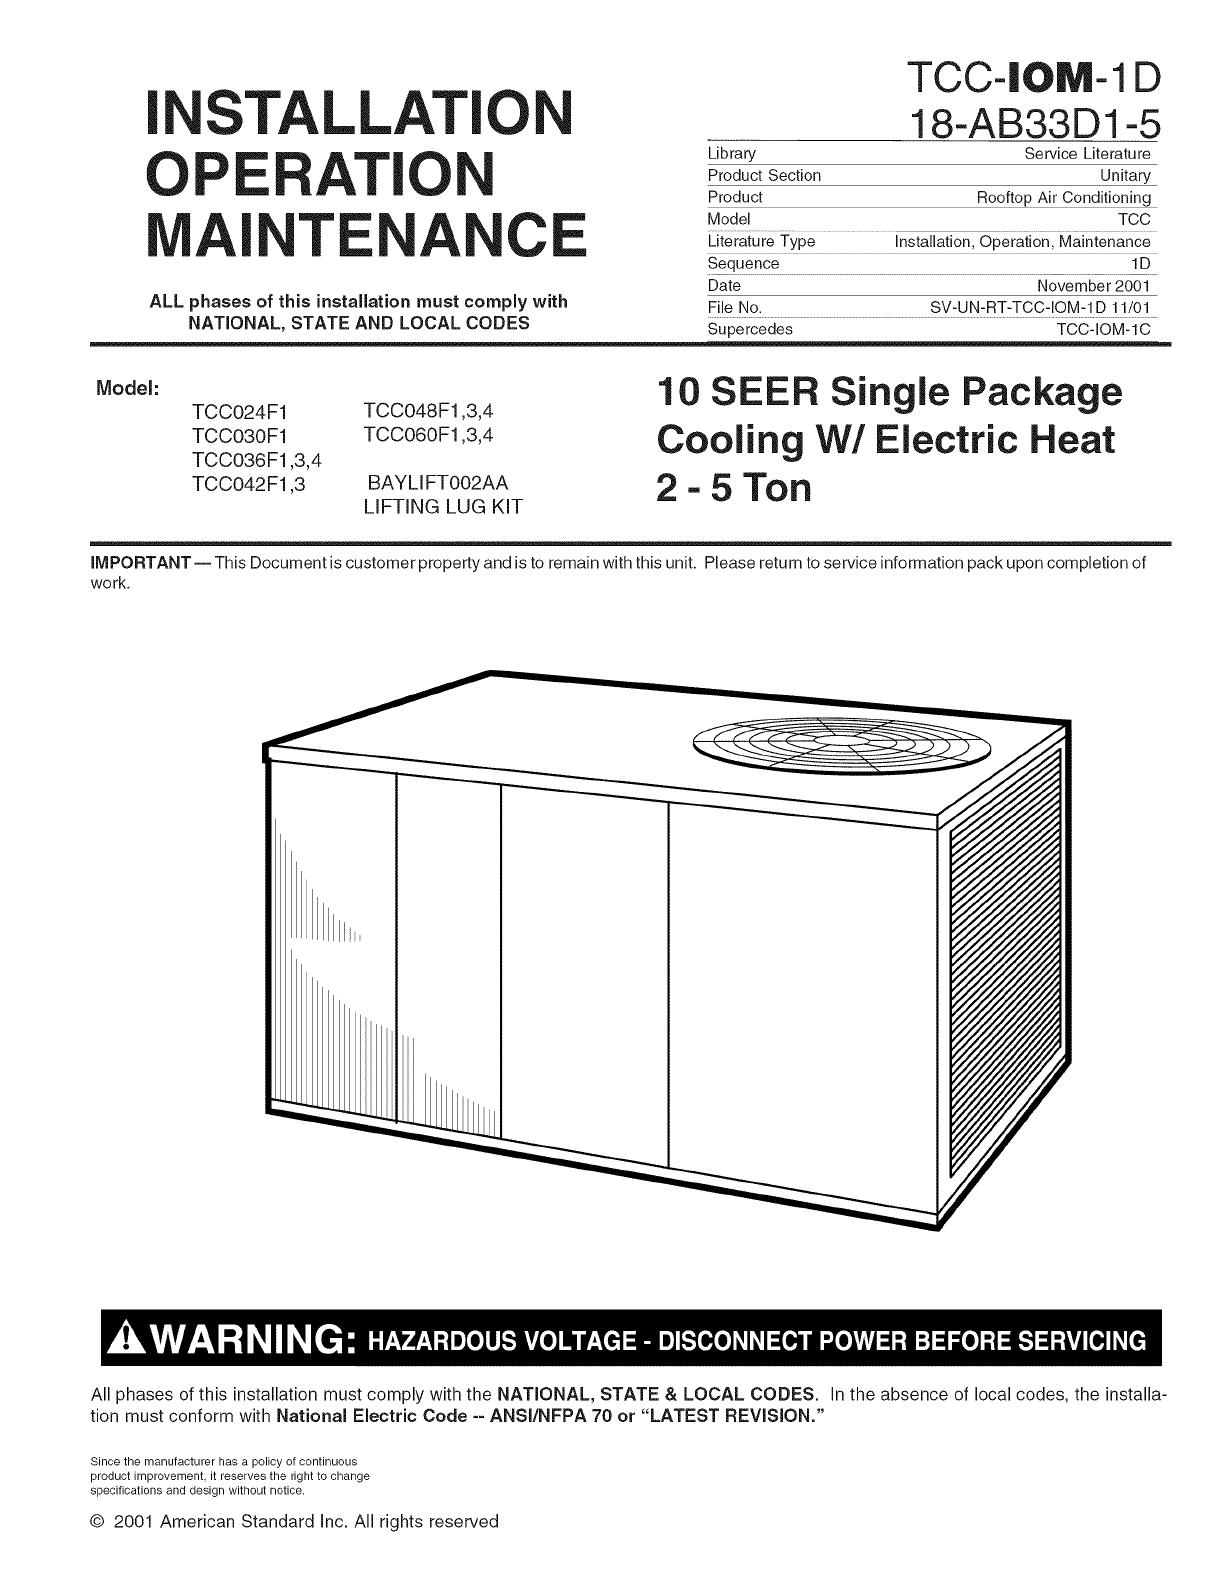 trane package units both units combined manual l0903219 rh usermanual wiki